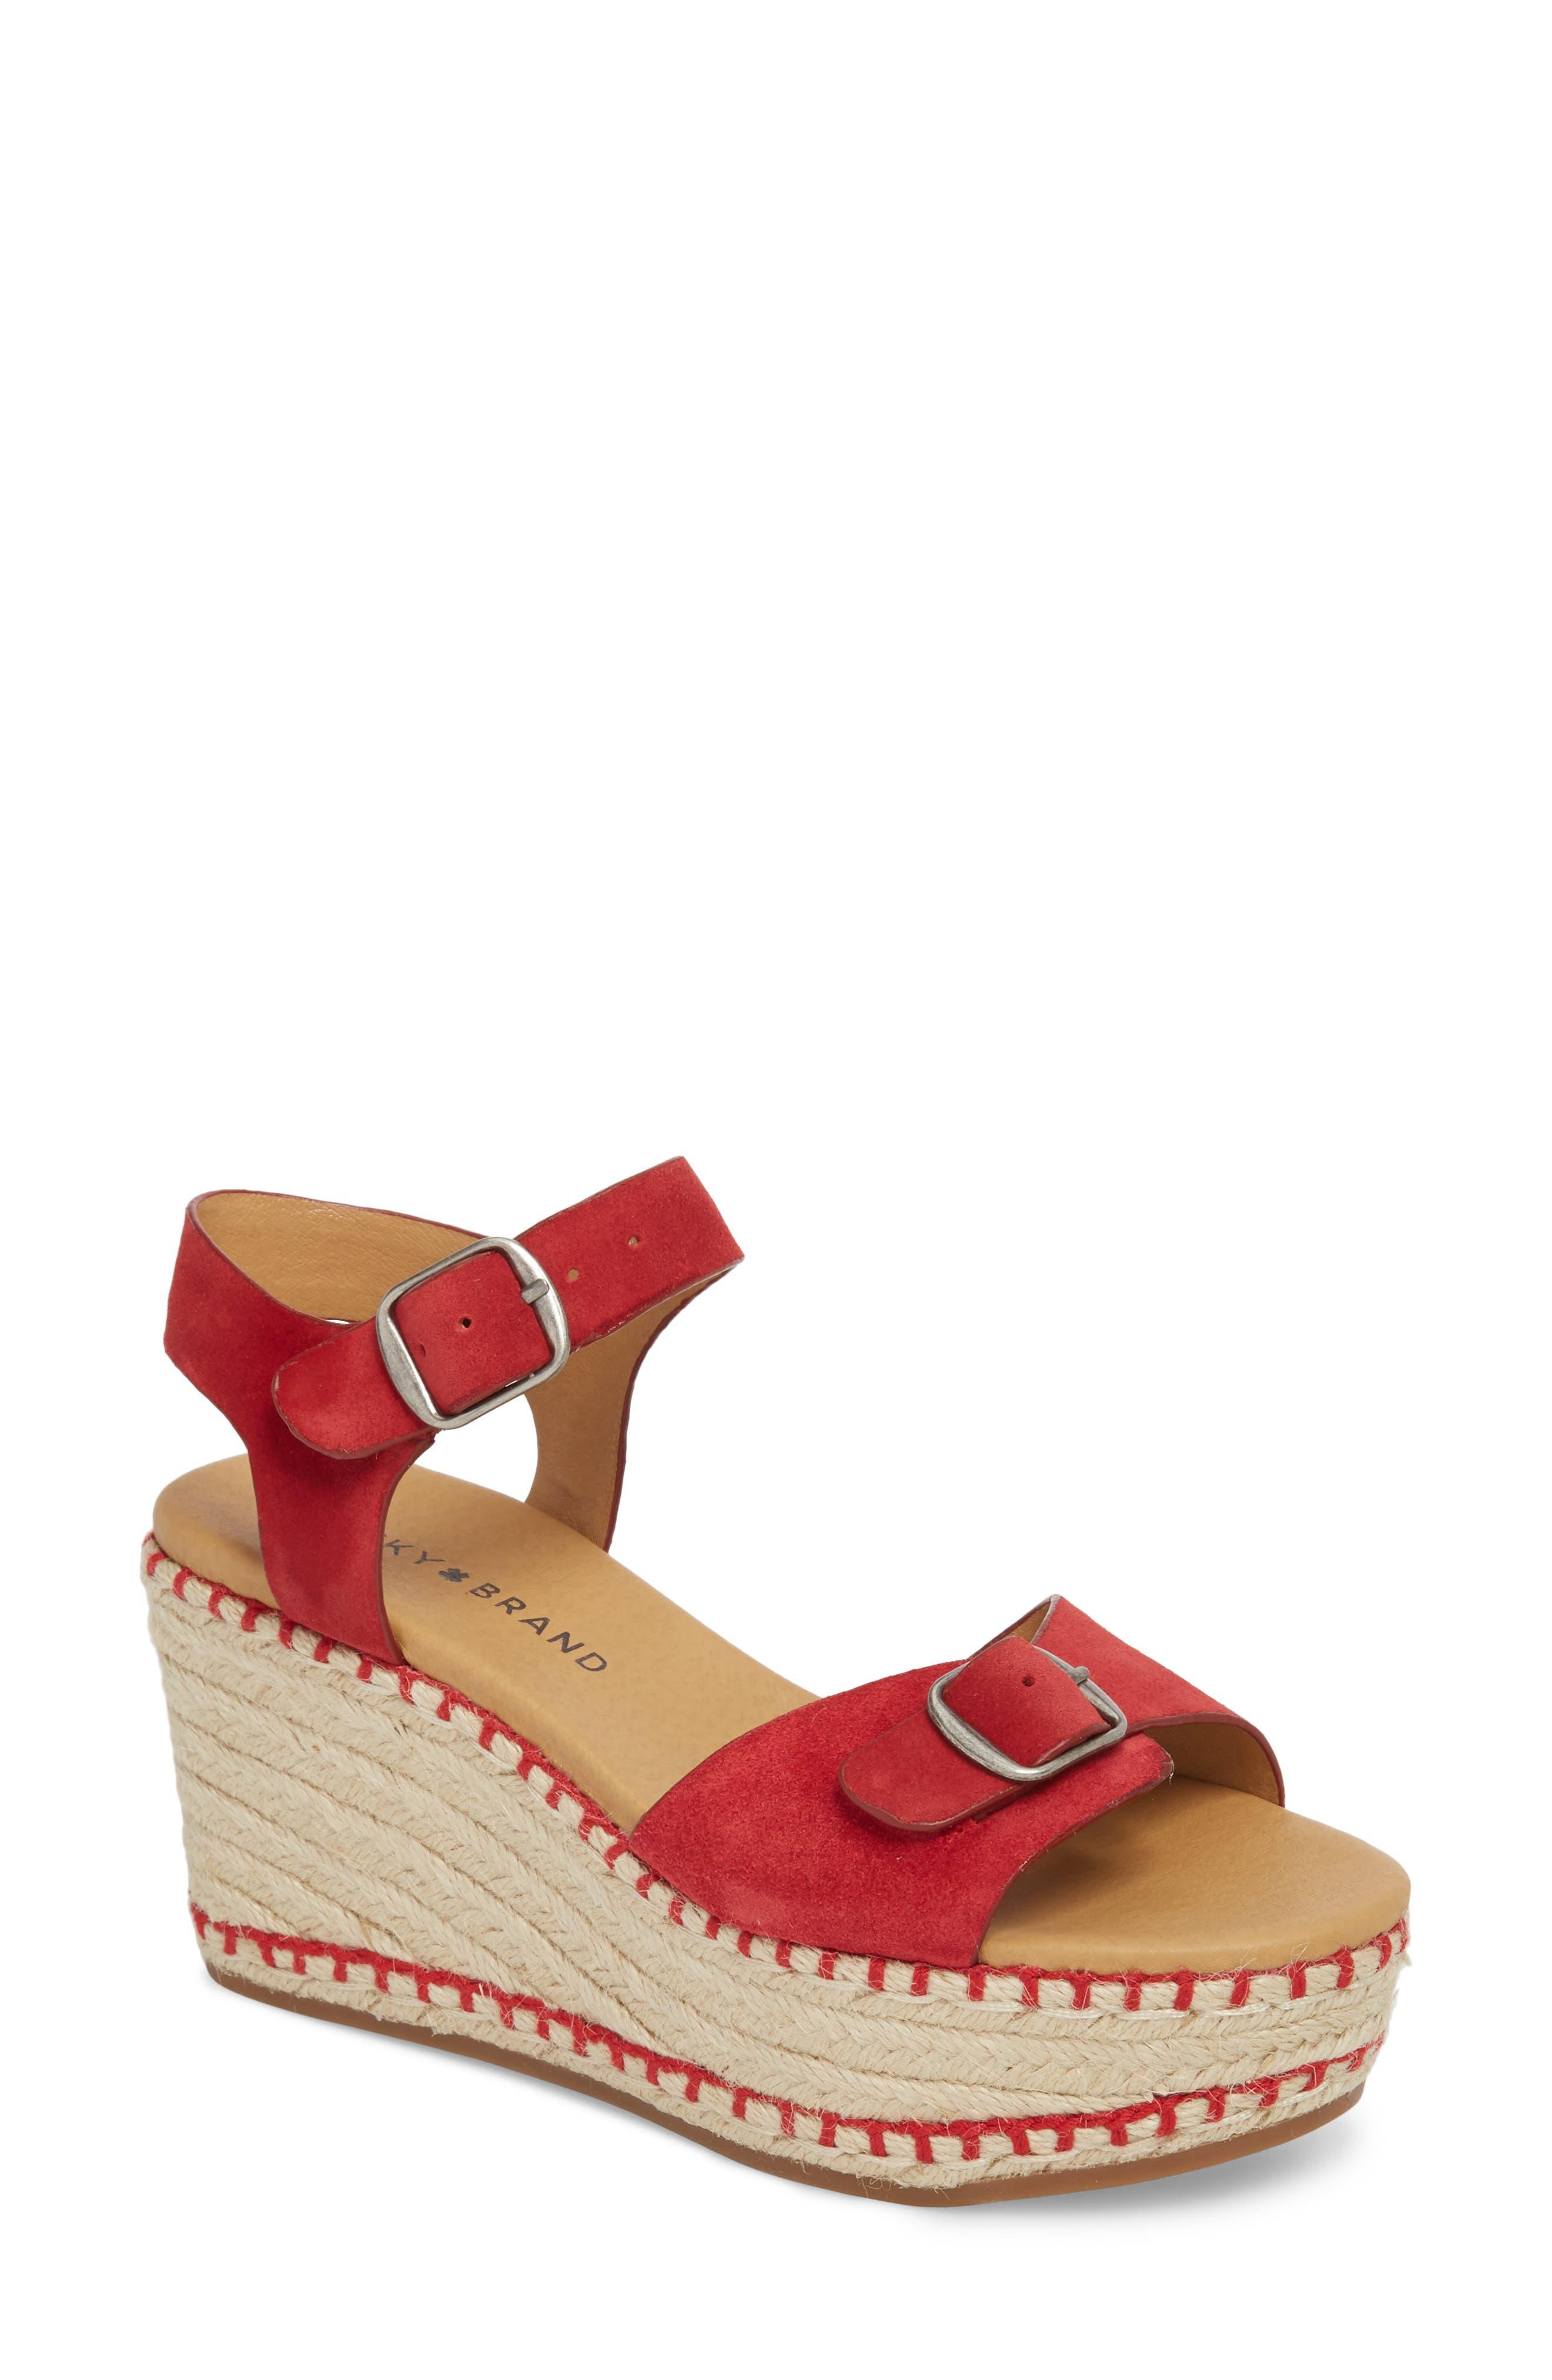 Naveah III Espadrille Wedge Sandal,                         Main,                         color, 640